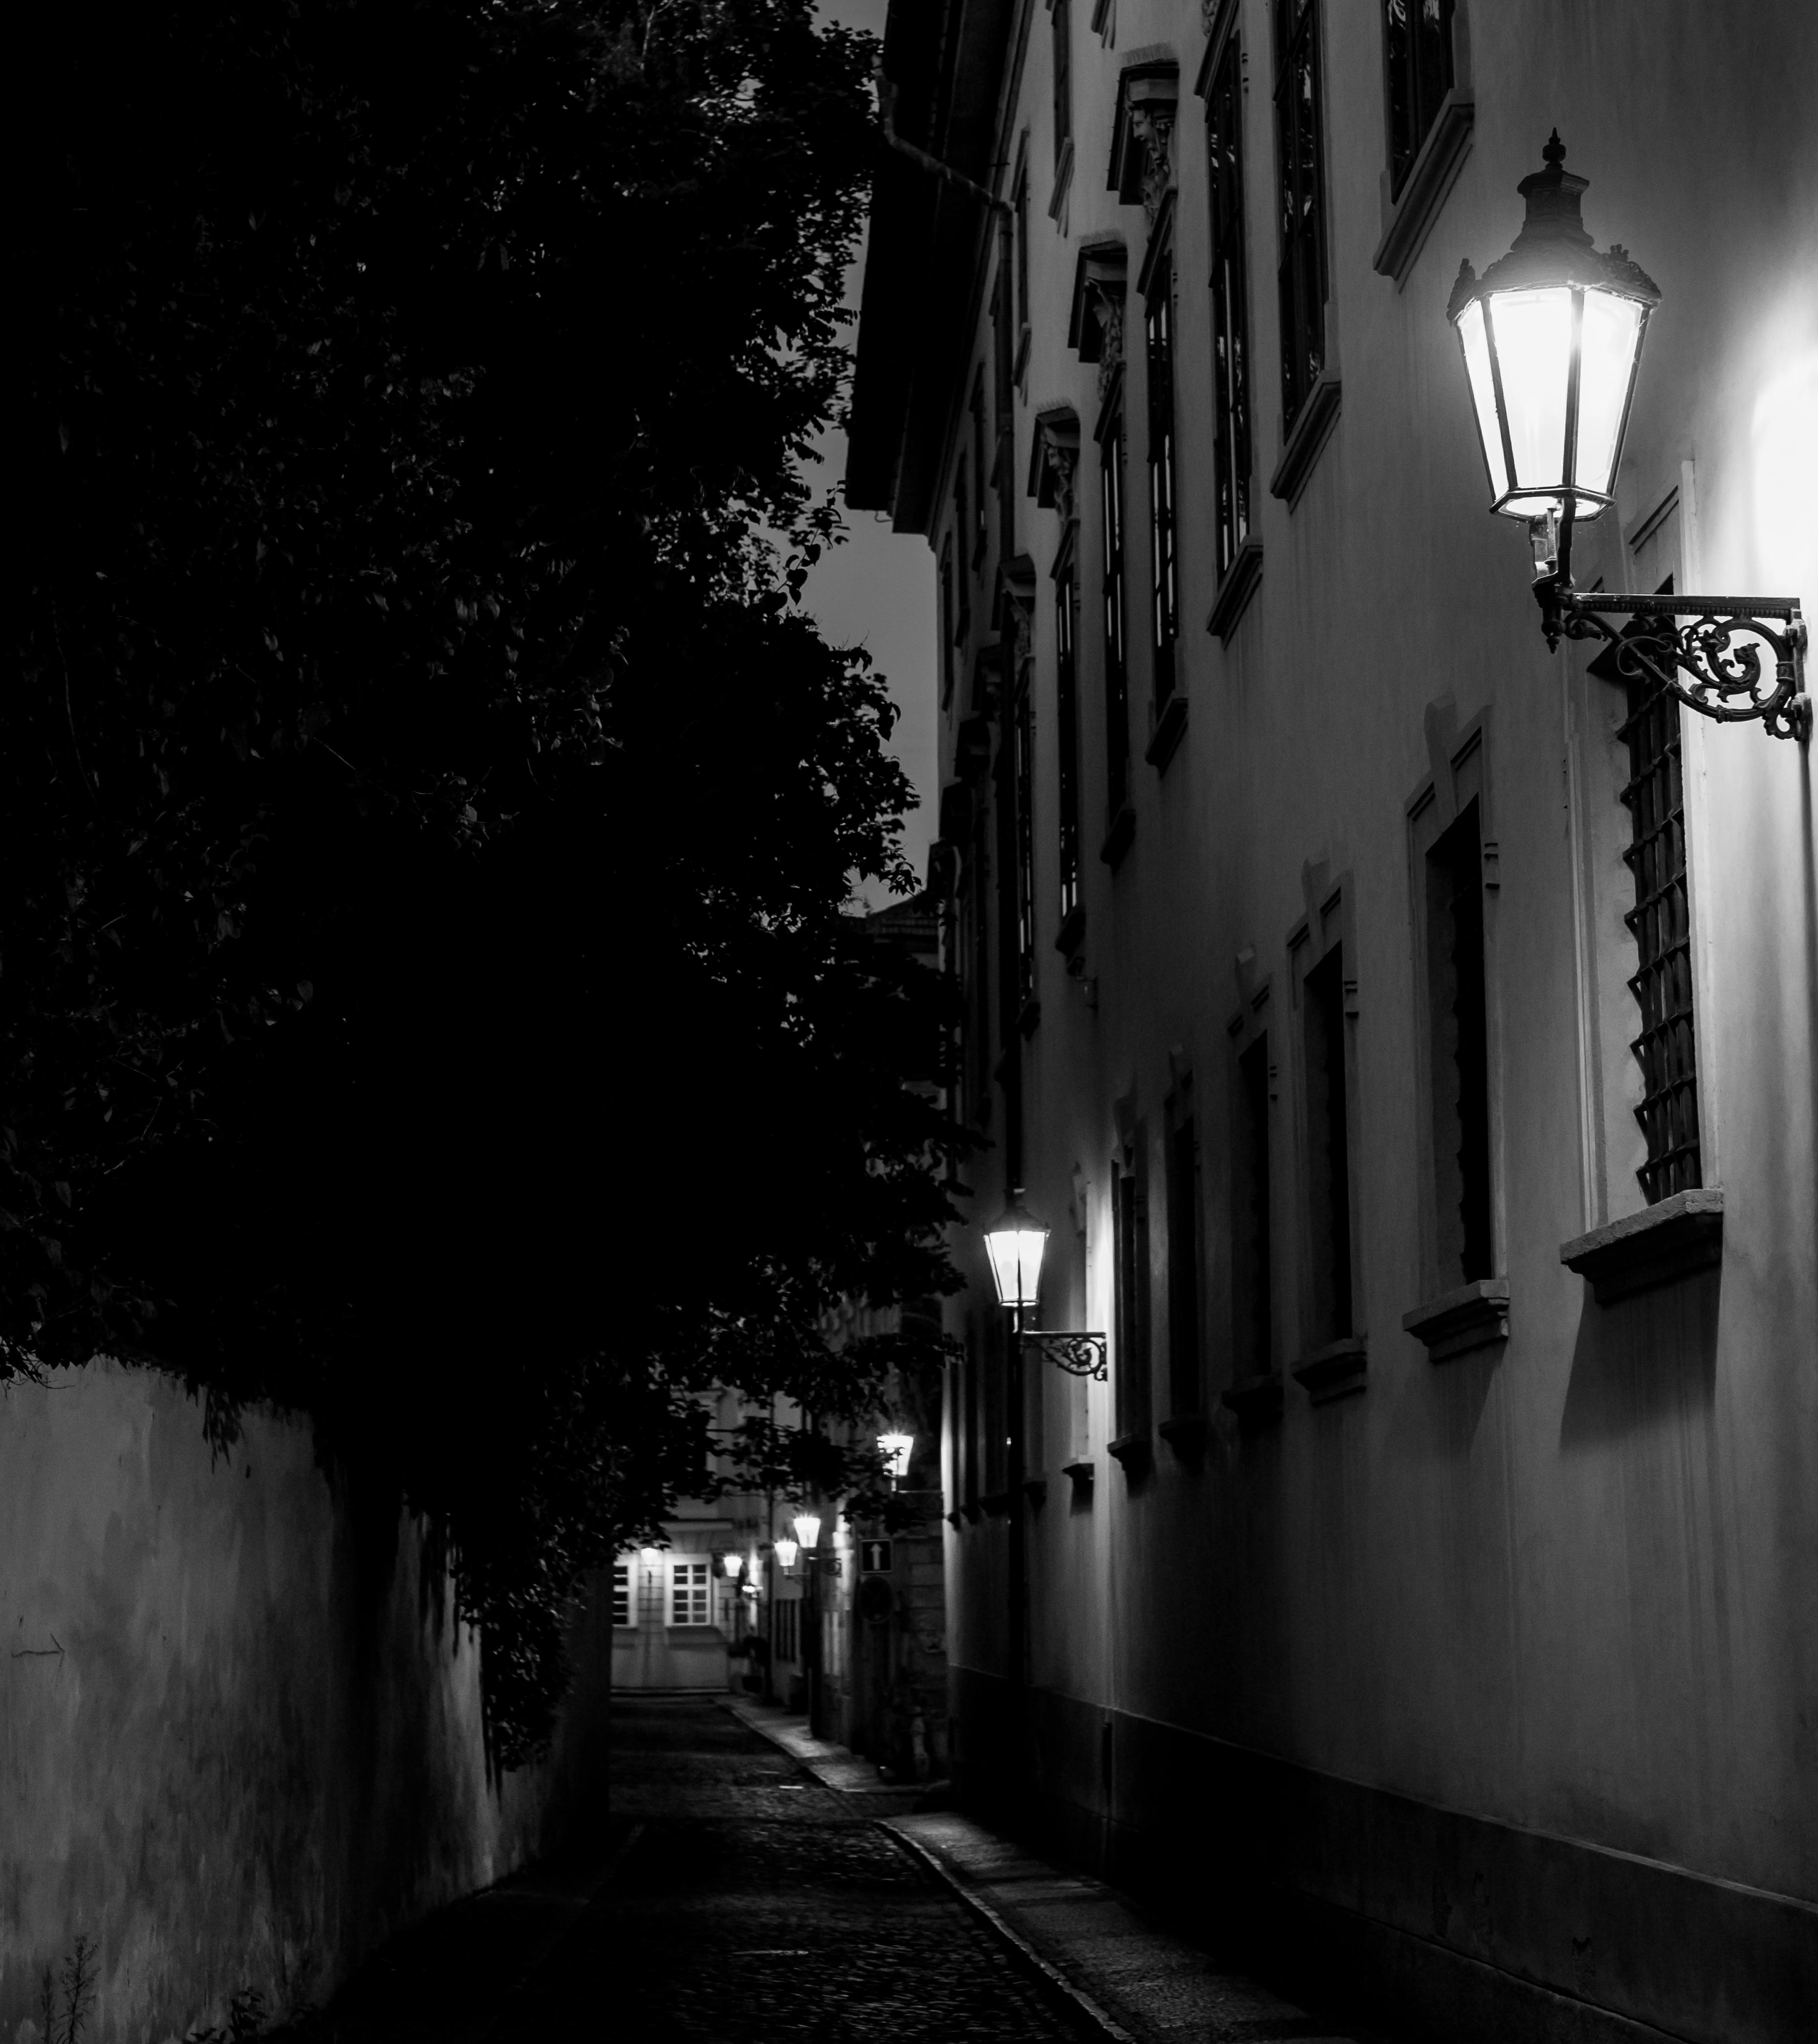 Улица фонарь картинка